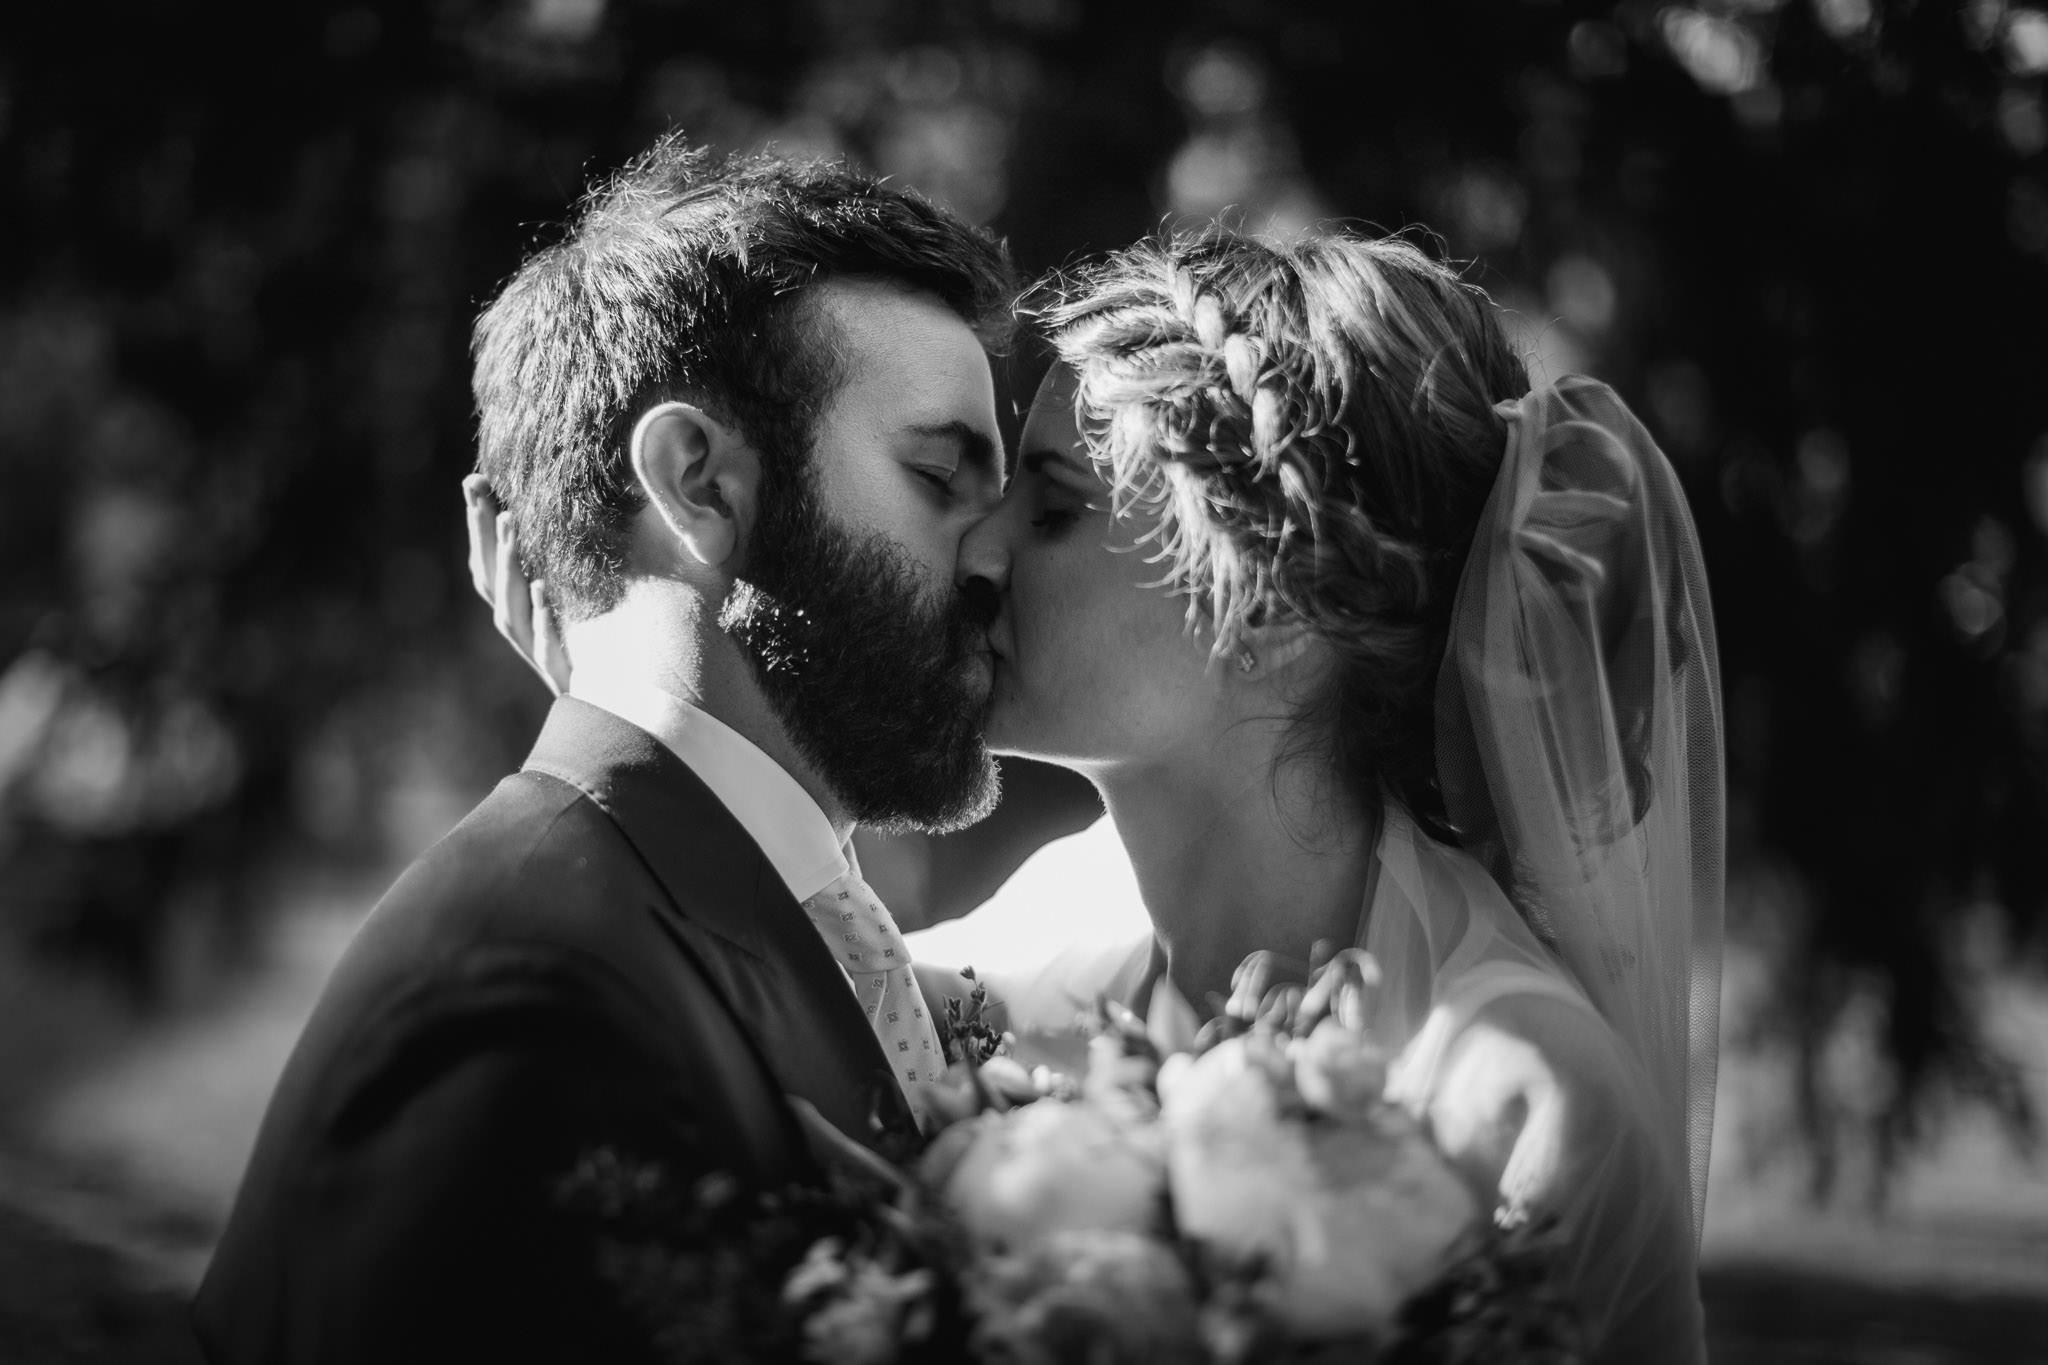 fotografia_di_matrimonio_portfolio-1082